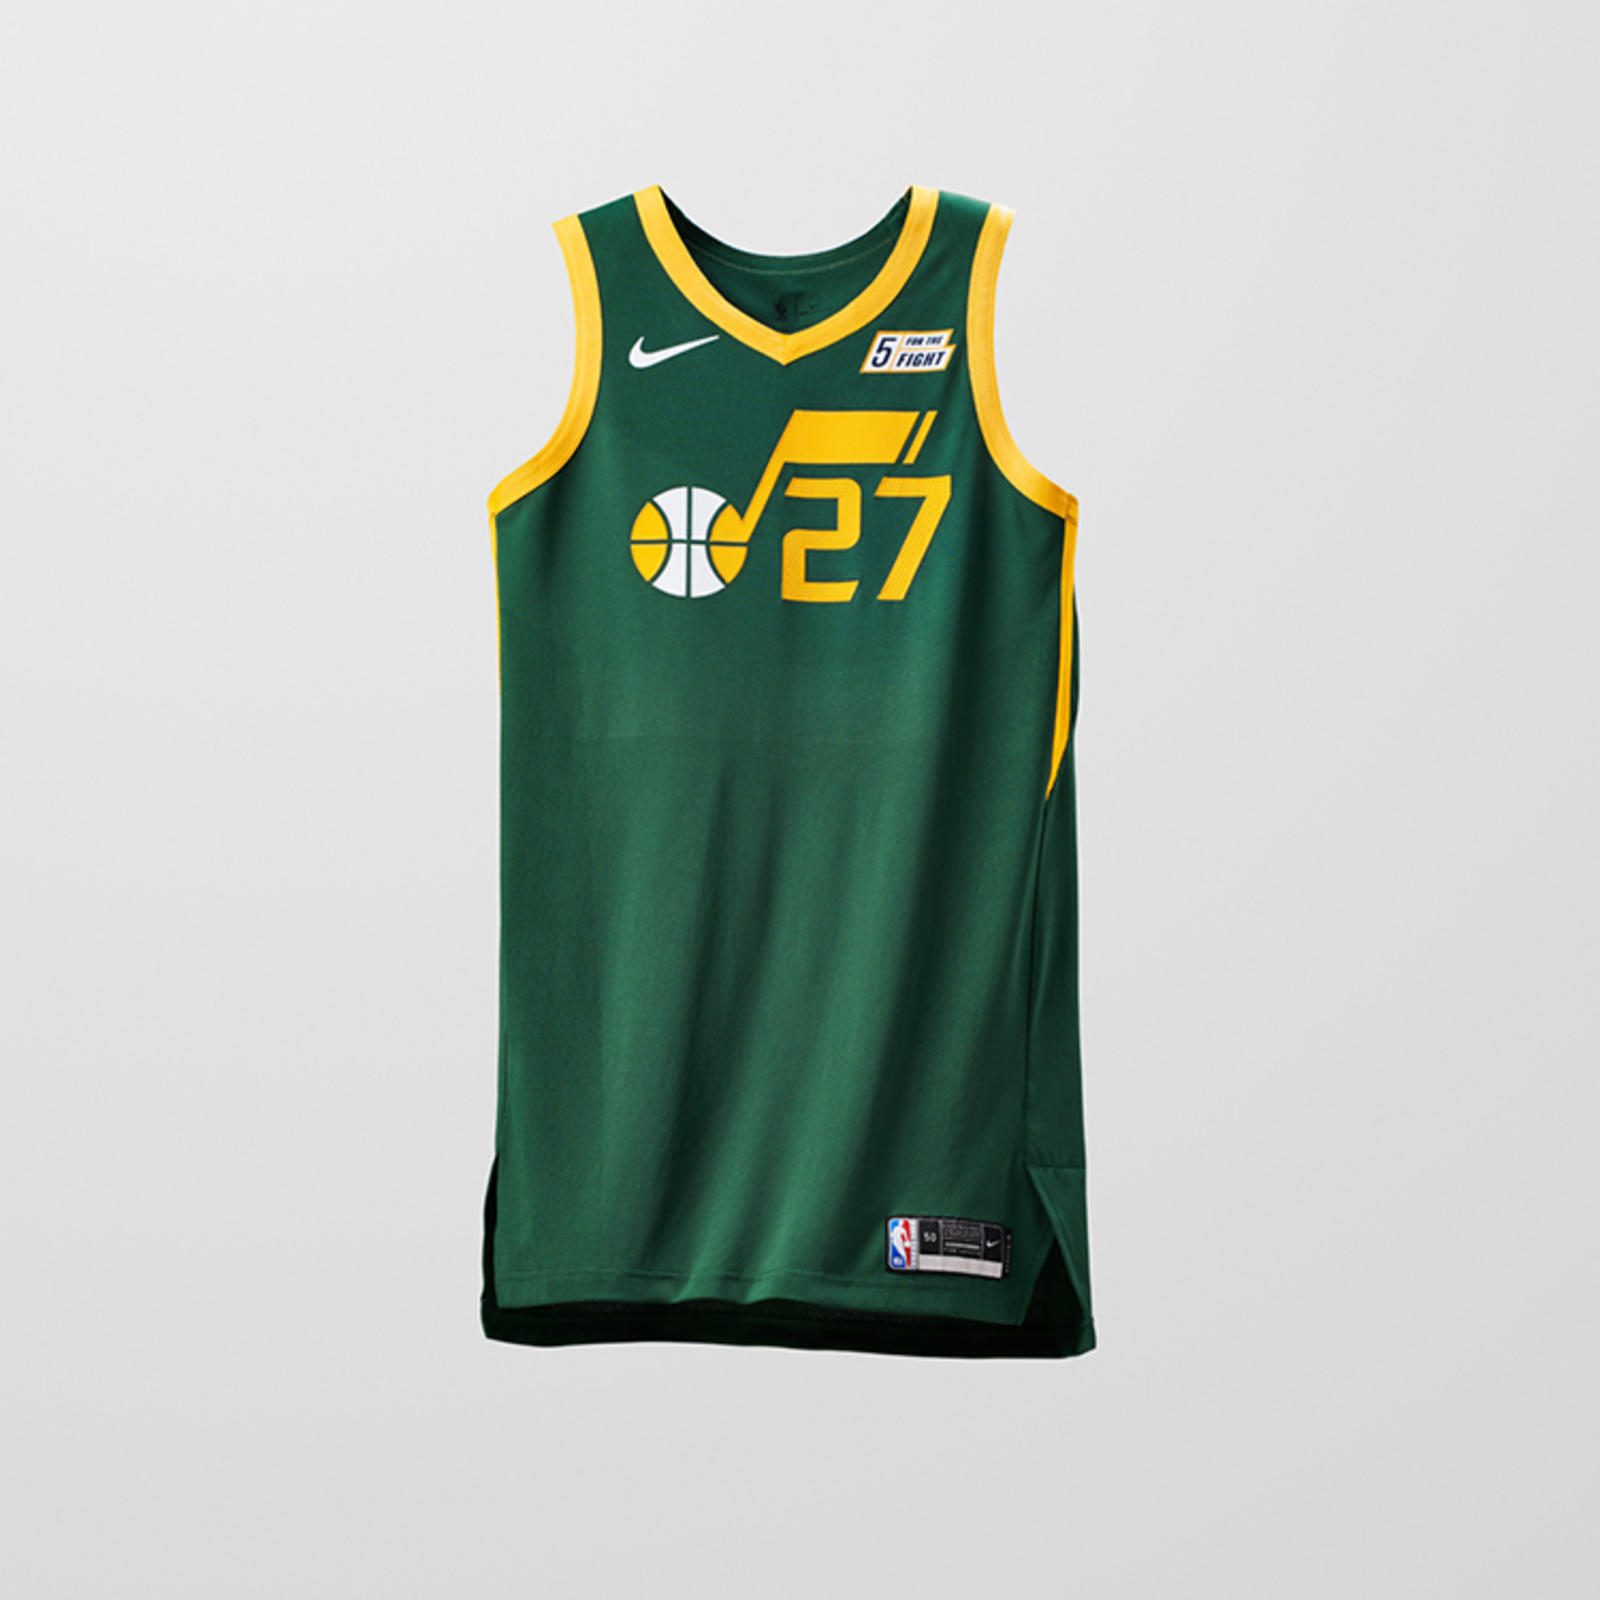 858ba99dd9c NBA Earned Edition Uniforms - Nike News